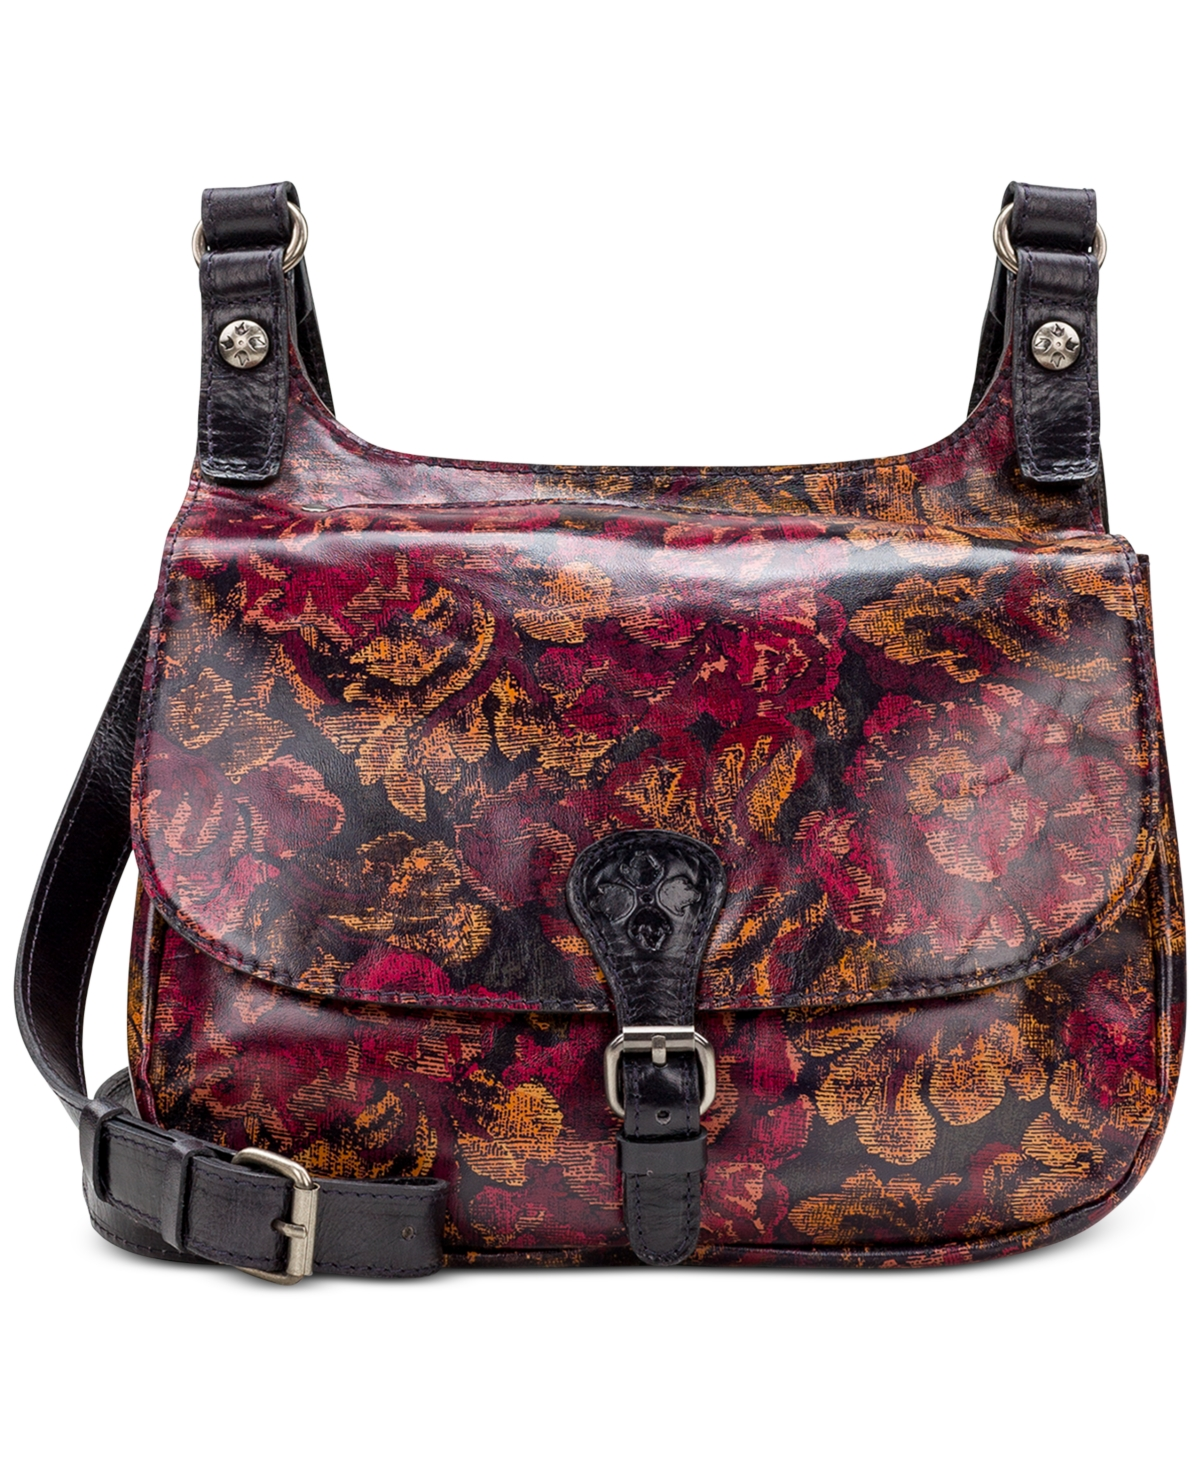 Patricia Nash London Leather Saddle Bag